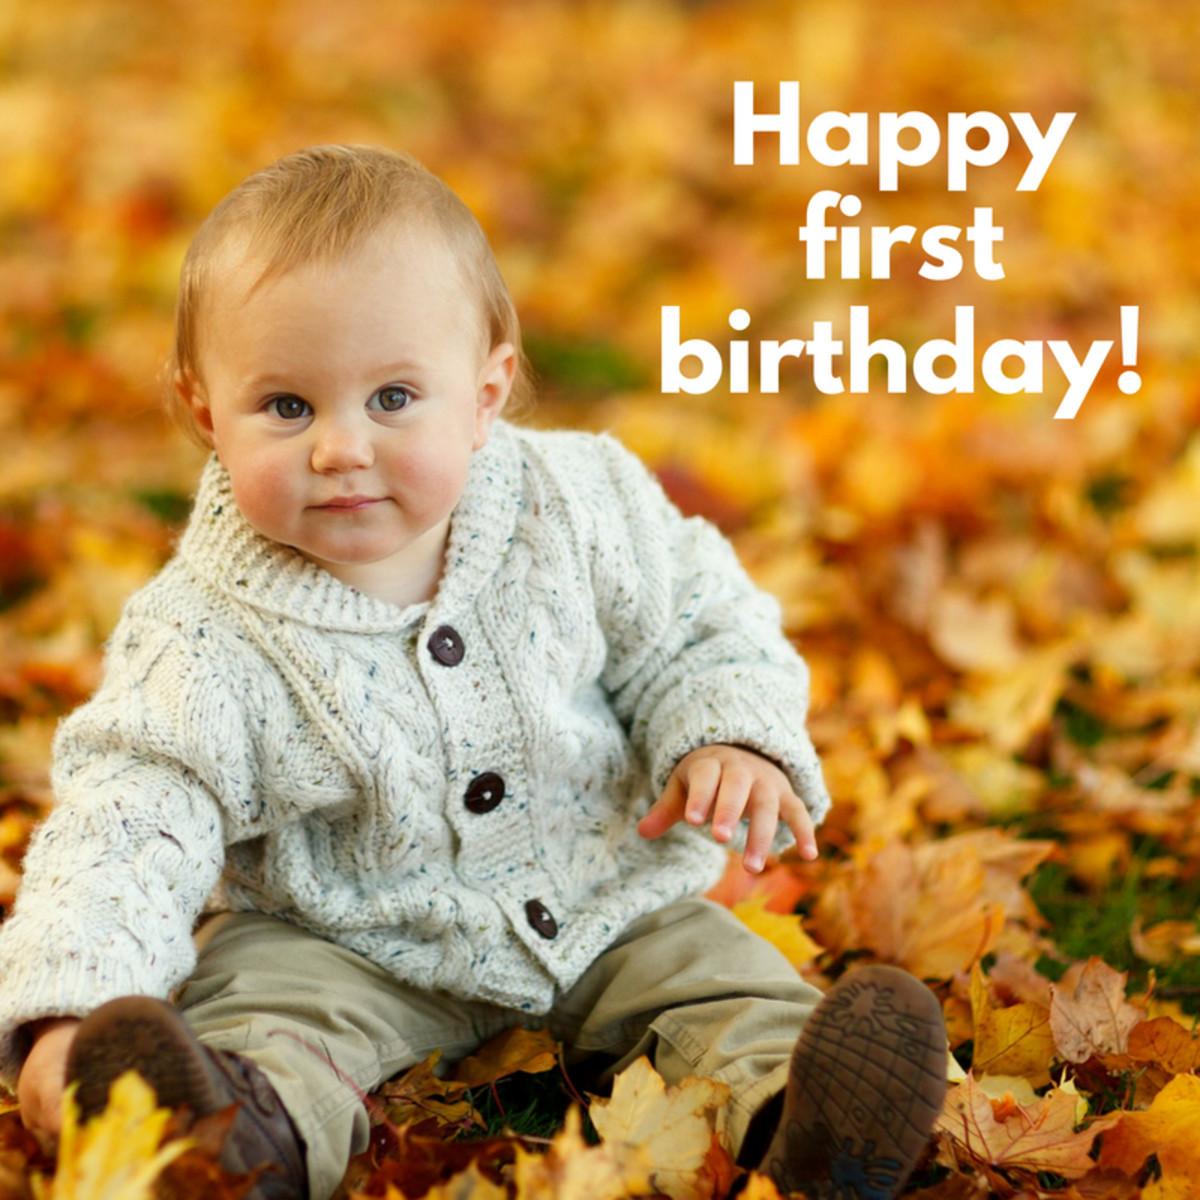 50 first birthday wishes